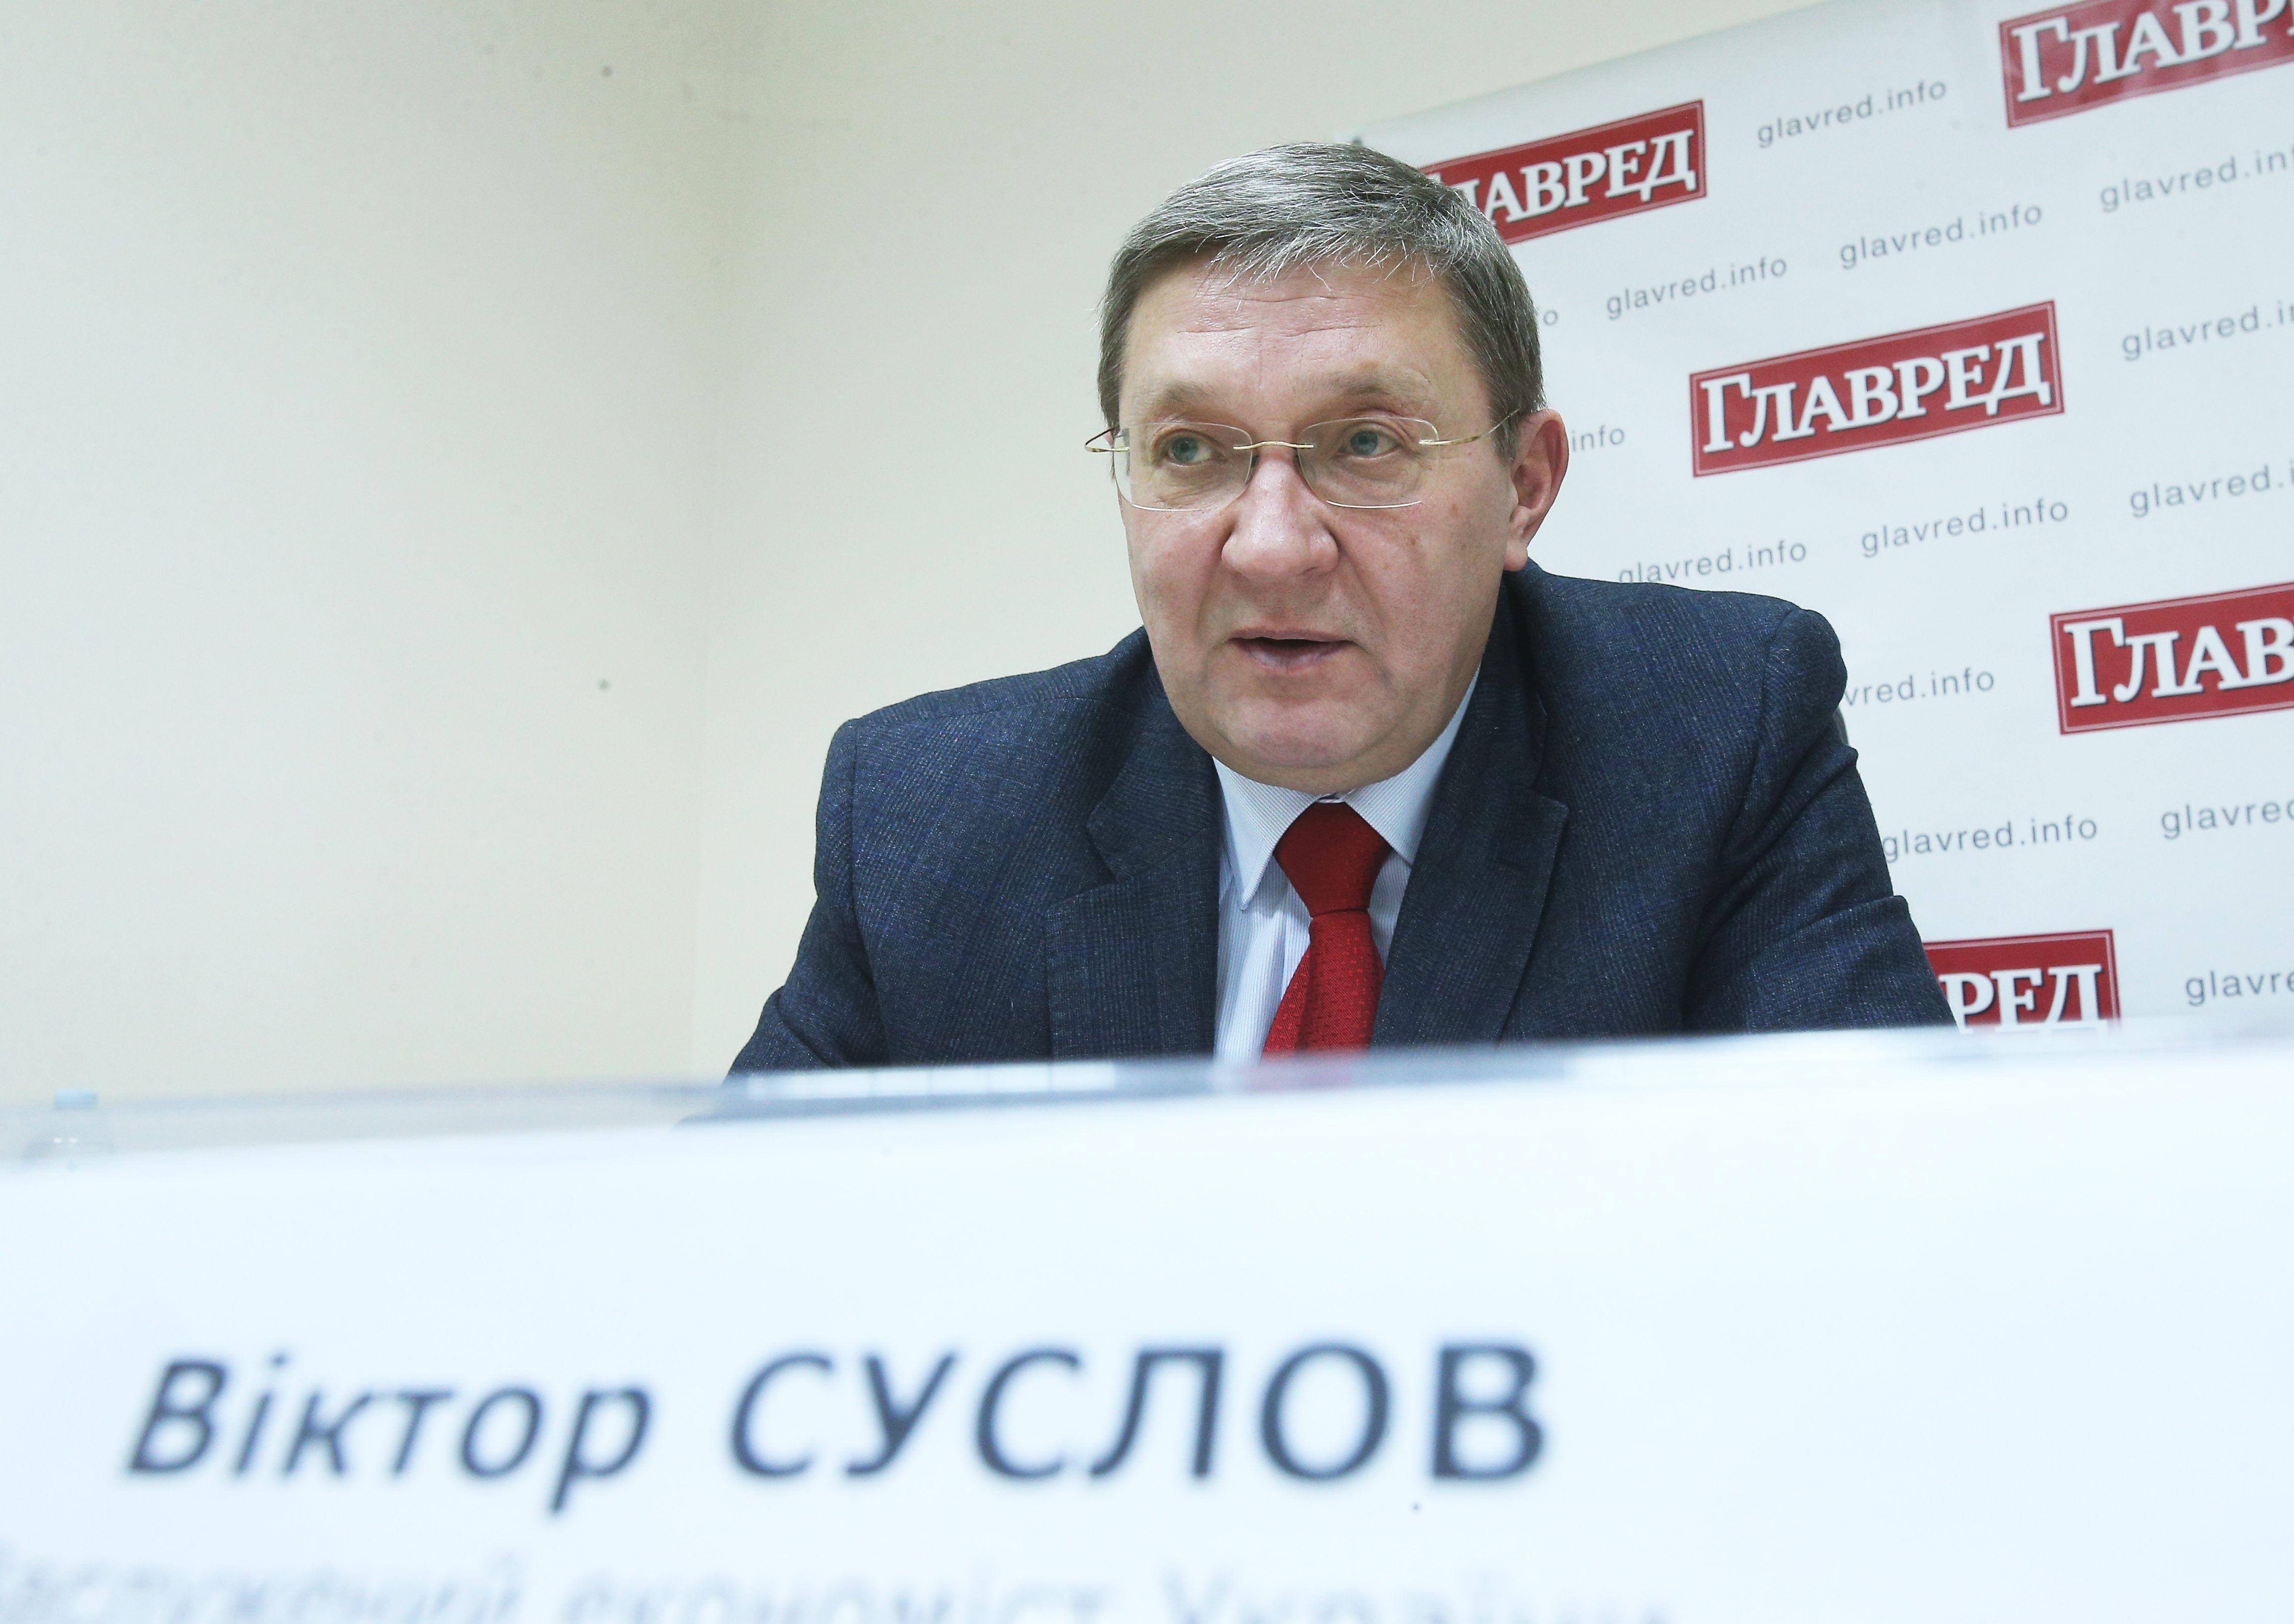 Виктор Суслов / Главред